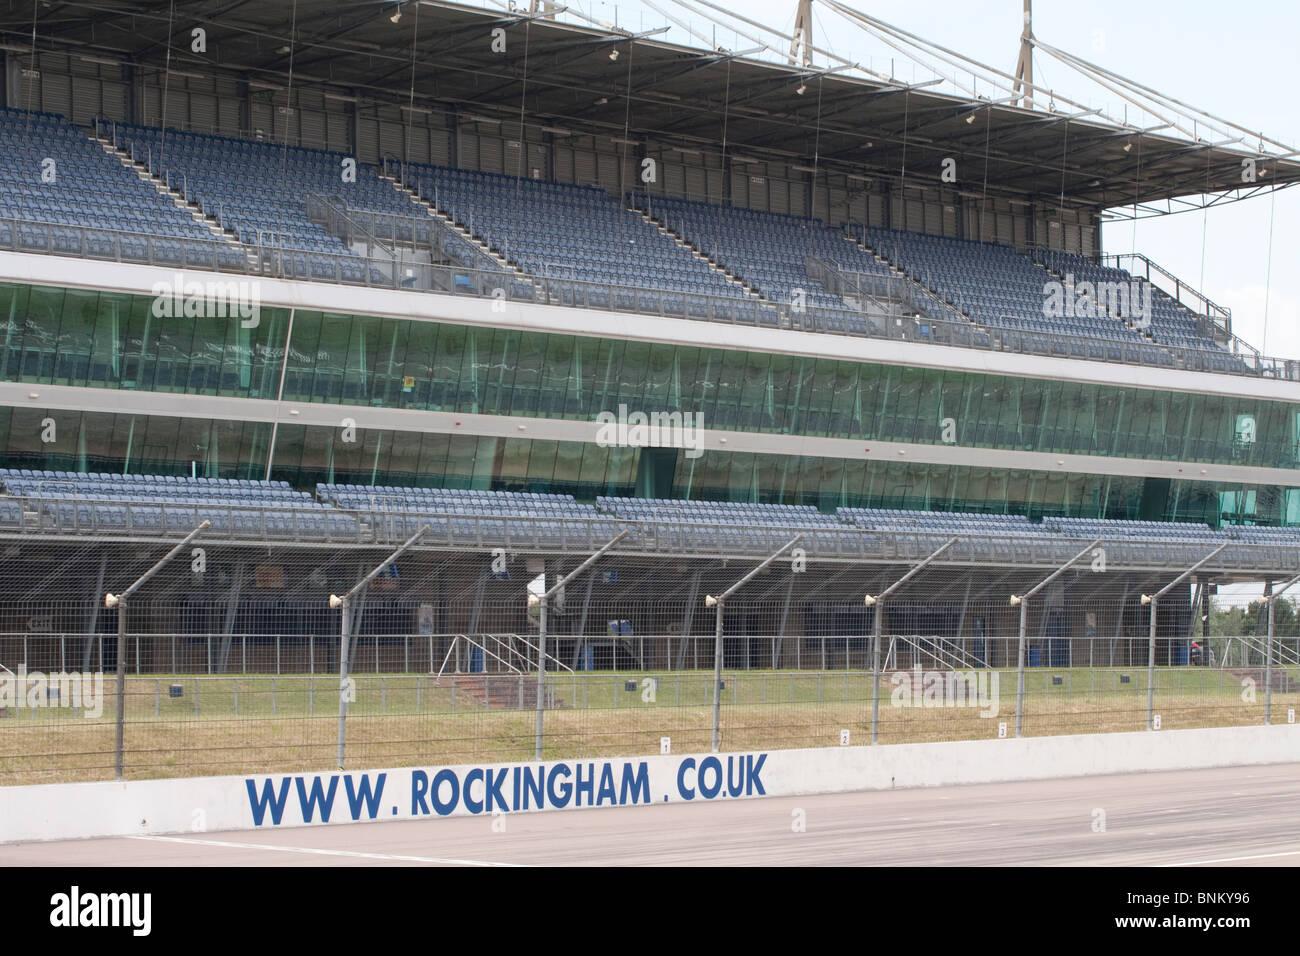 Rockingham Motor Speedway stadium - Stock Image